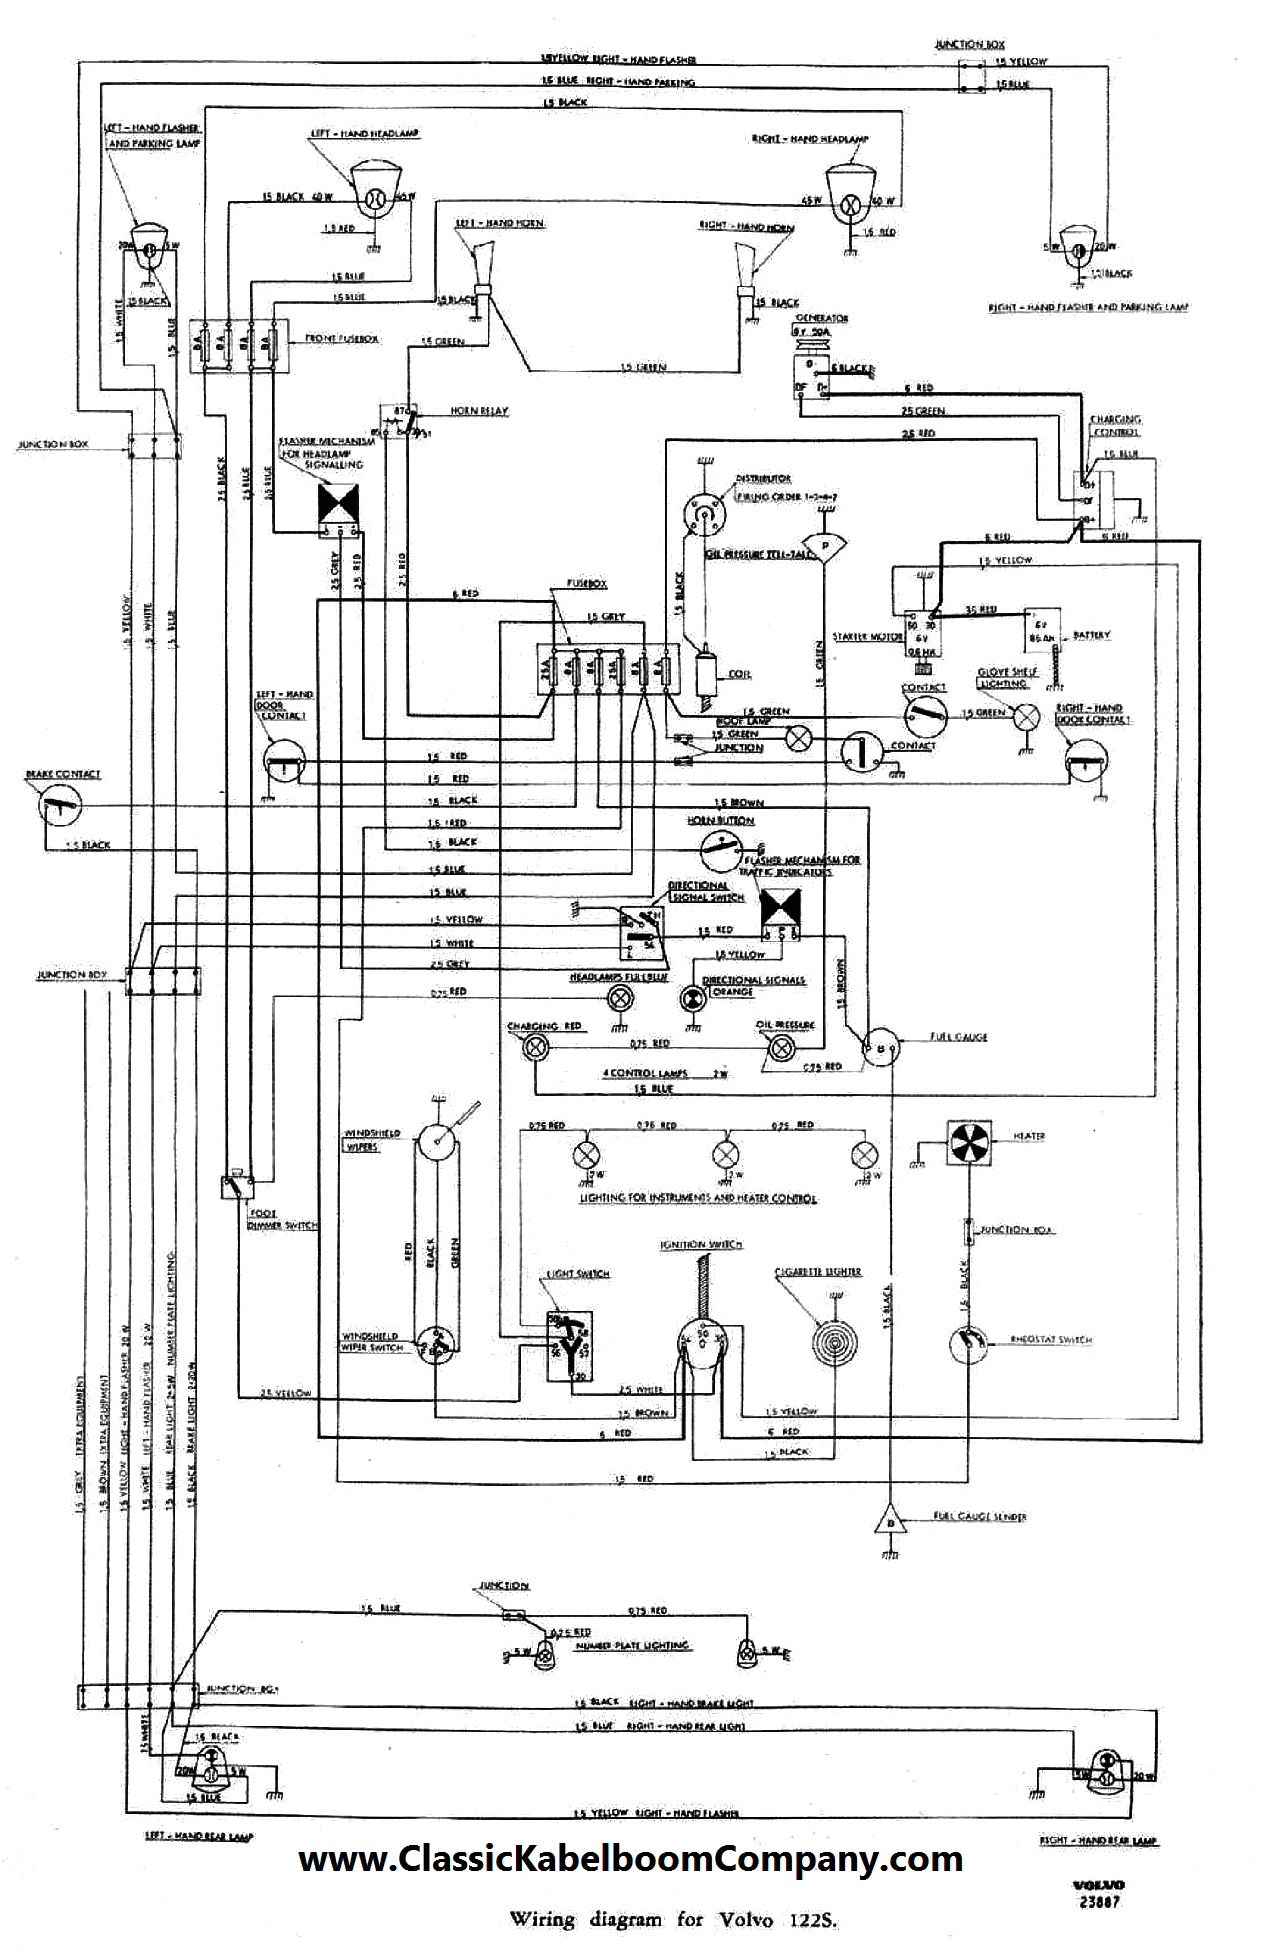 Clic Kabelboom Company - Elektrisch bedrading schema Volvo ...